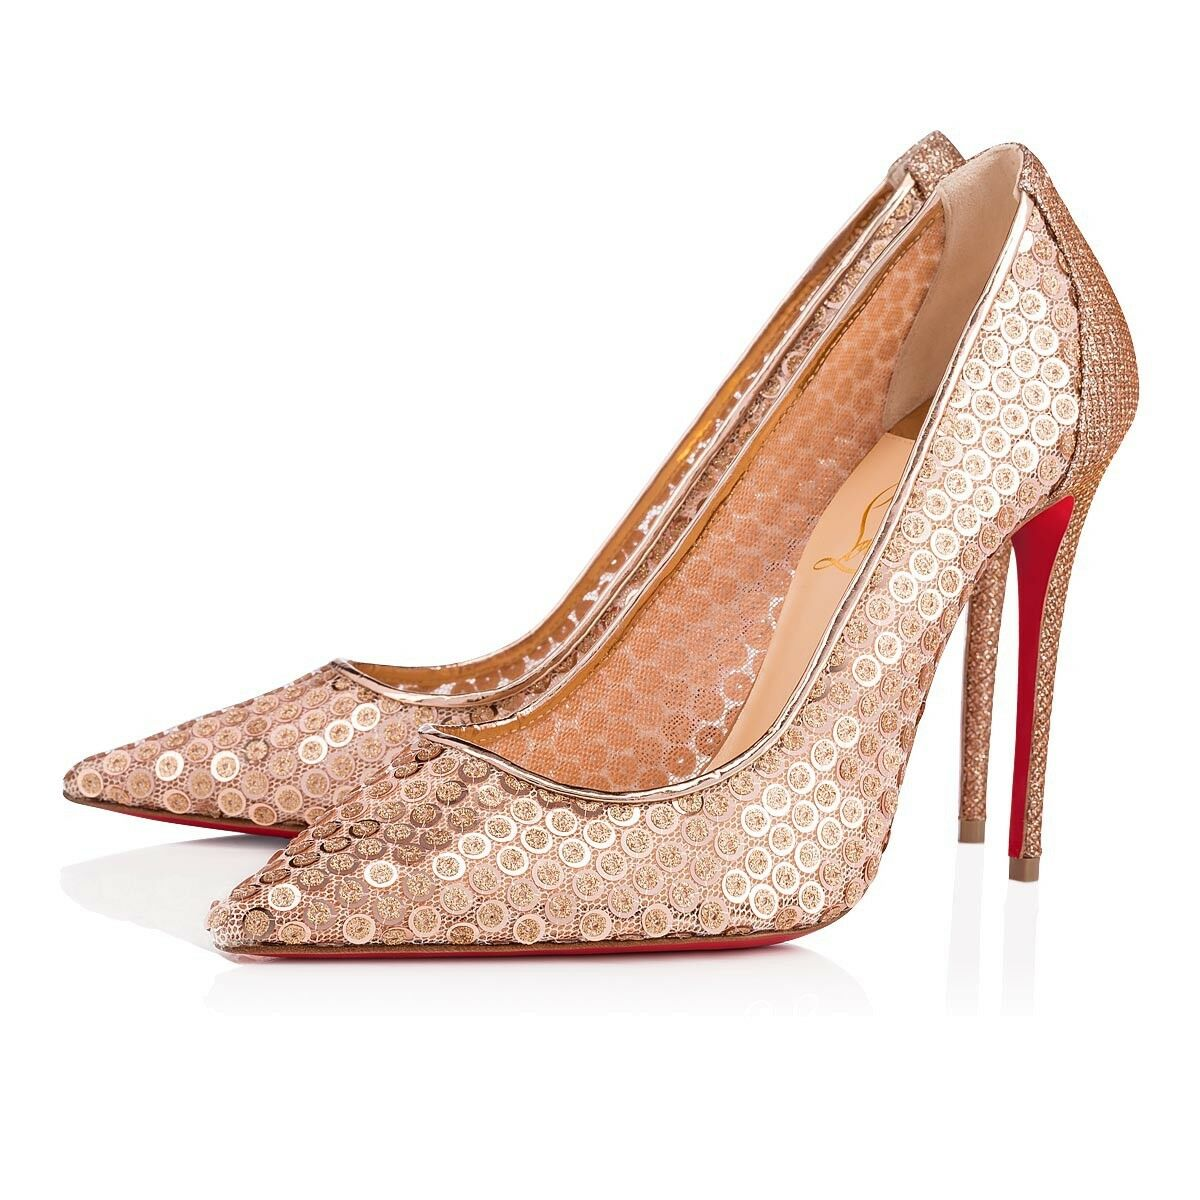 NIB Christian Louboutin Lace 554 100 Nude gold Glitter Pigalle Heel Pump 35.5